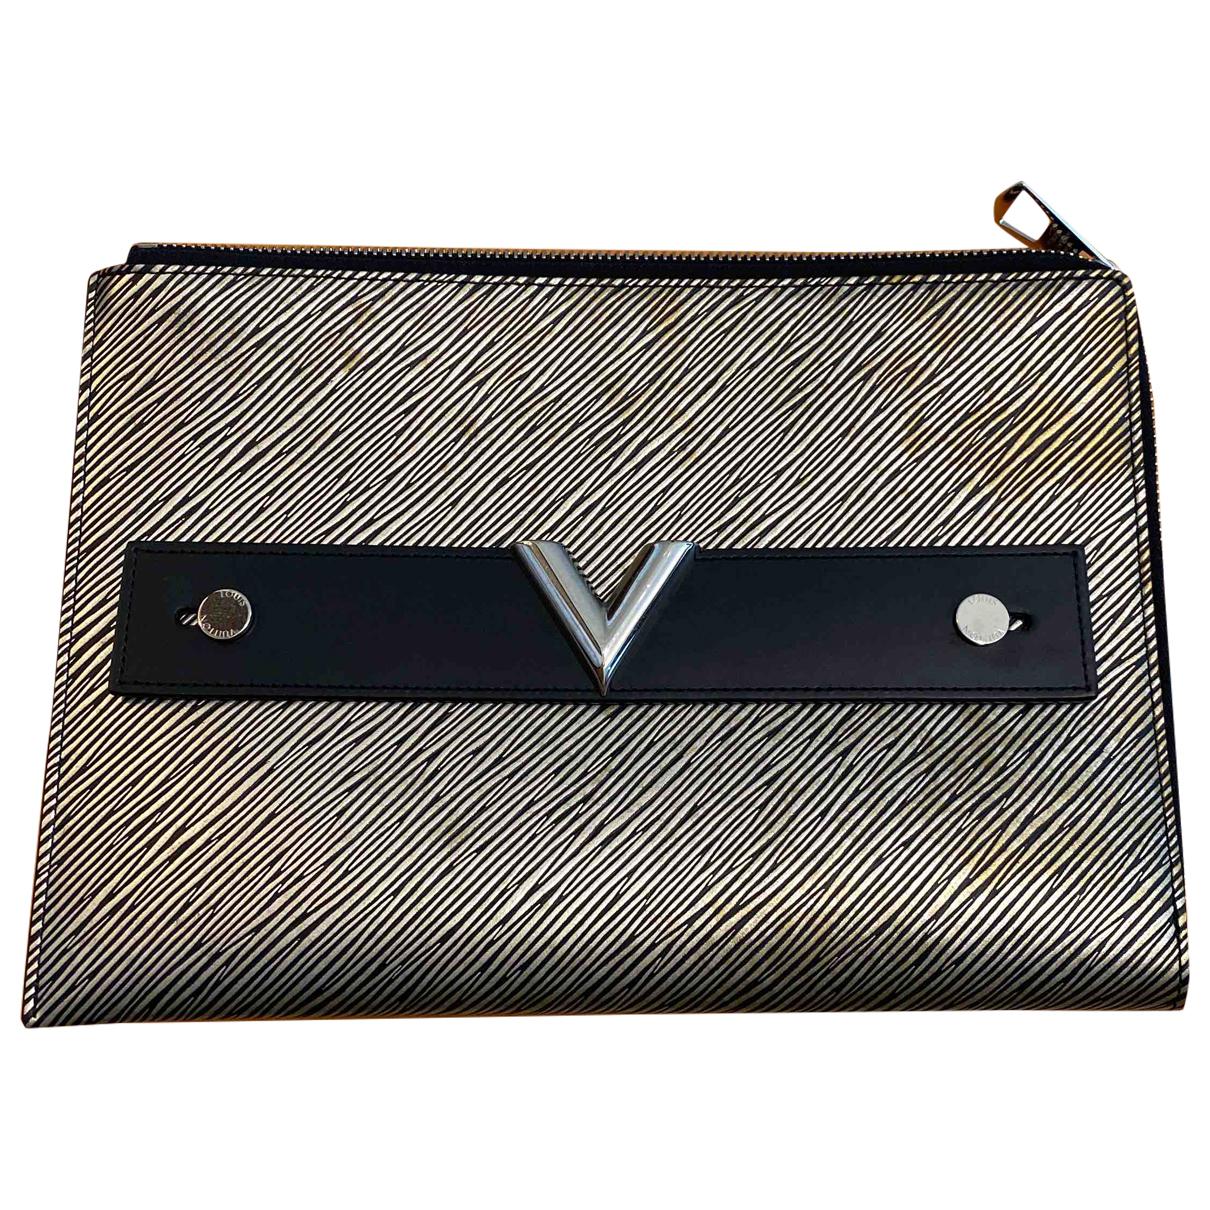 Louis Vuitton \N Metallic Leather Clutch bag for Women \N